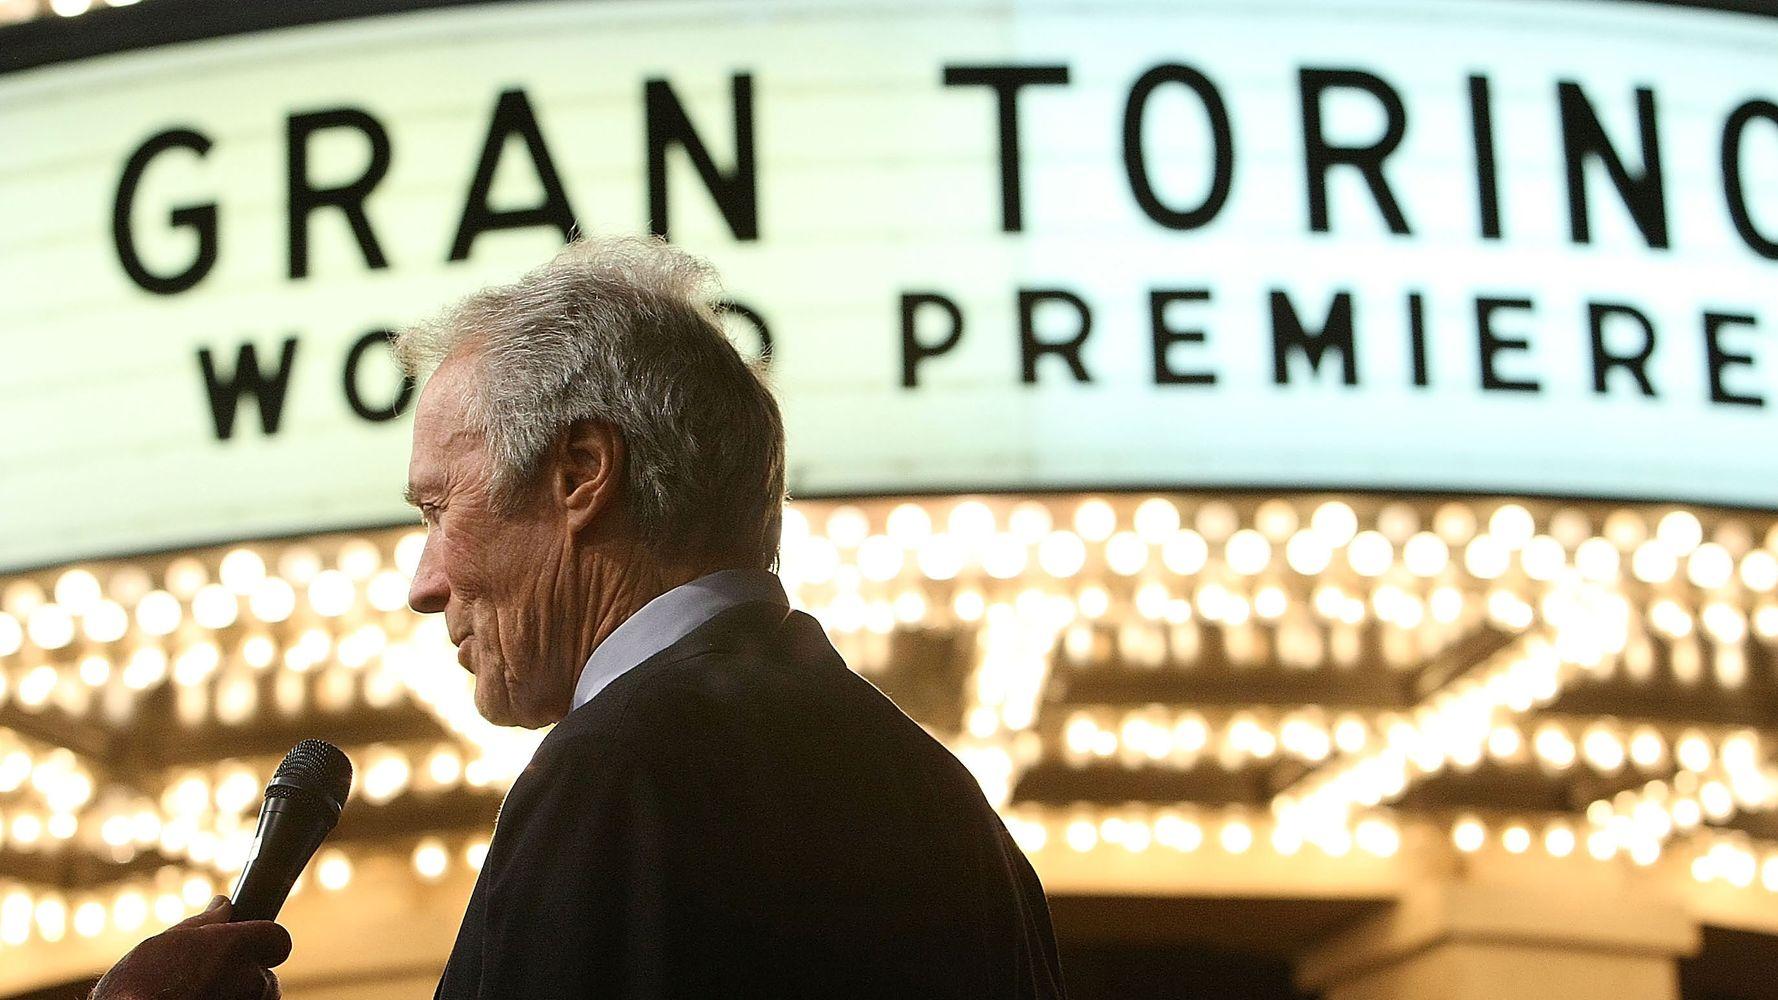 www.huffpost.com: 'Gran Torino' Actor Draws Parallels Between 2008 Film, Anti-Asian COVID-19 Racism